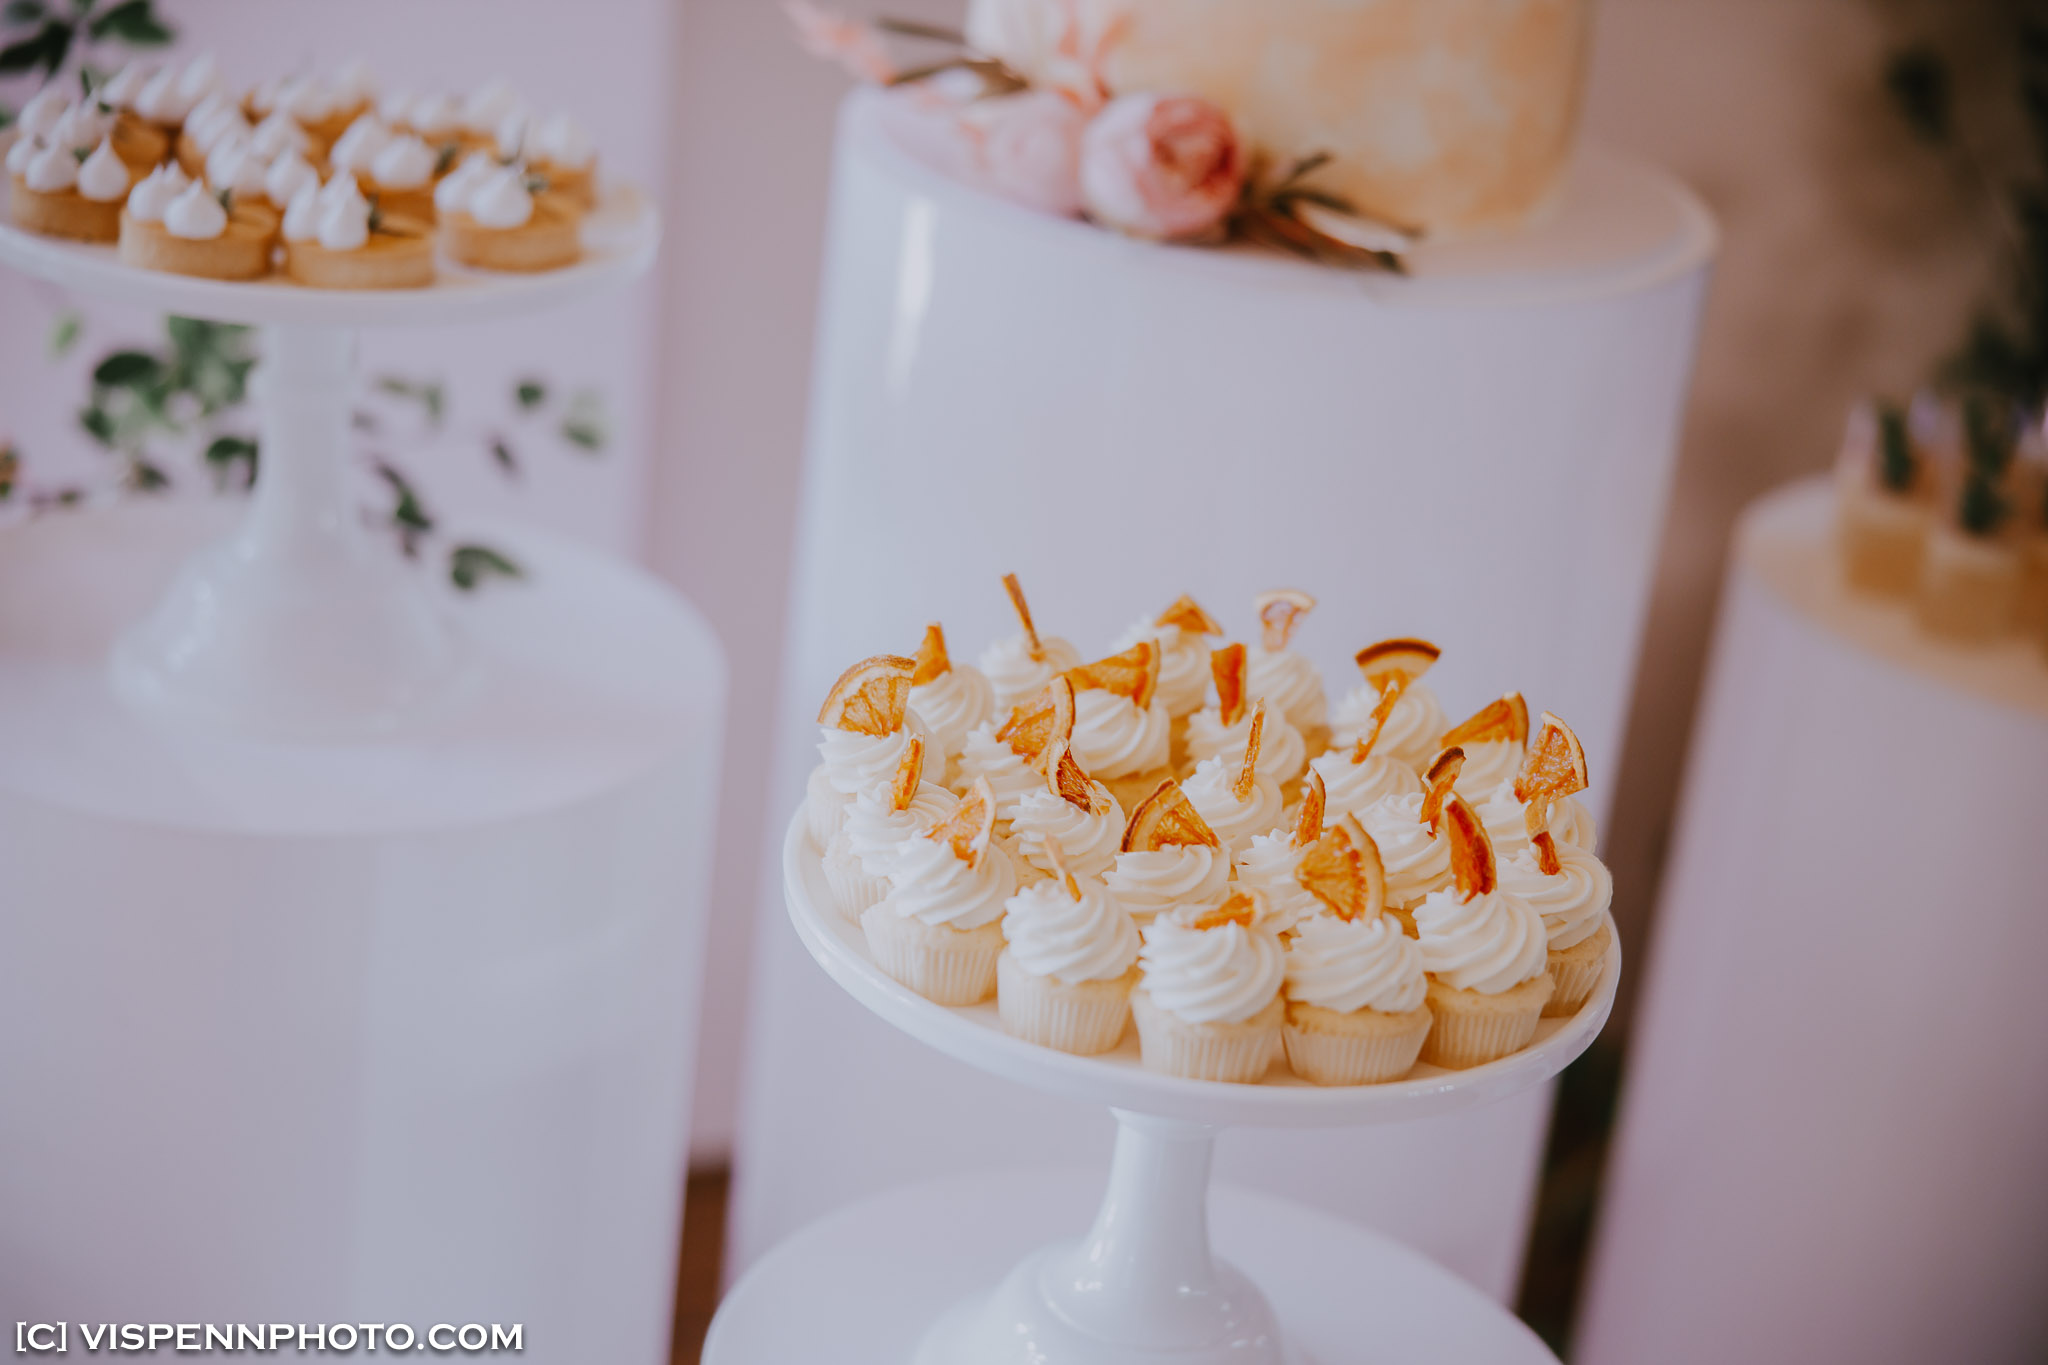 WEDDING DAY Photography Melbourne VISPENN 墨尔本 婚礼跟拍 婚礼摄像 婚礼摄影 结婚照 登记照 ElitaPB 07052 1P EOSR VISPENN